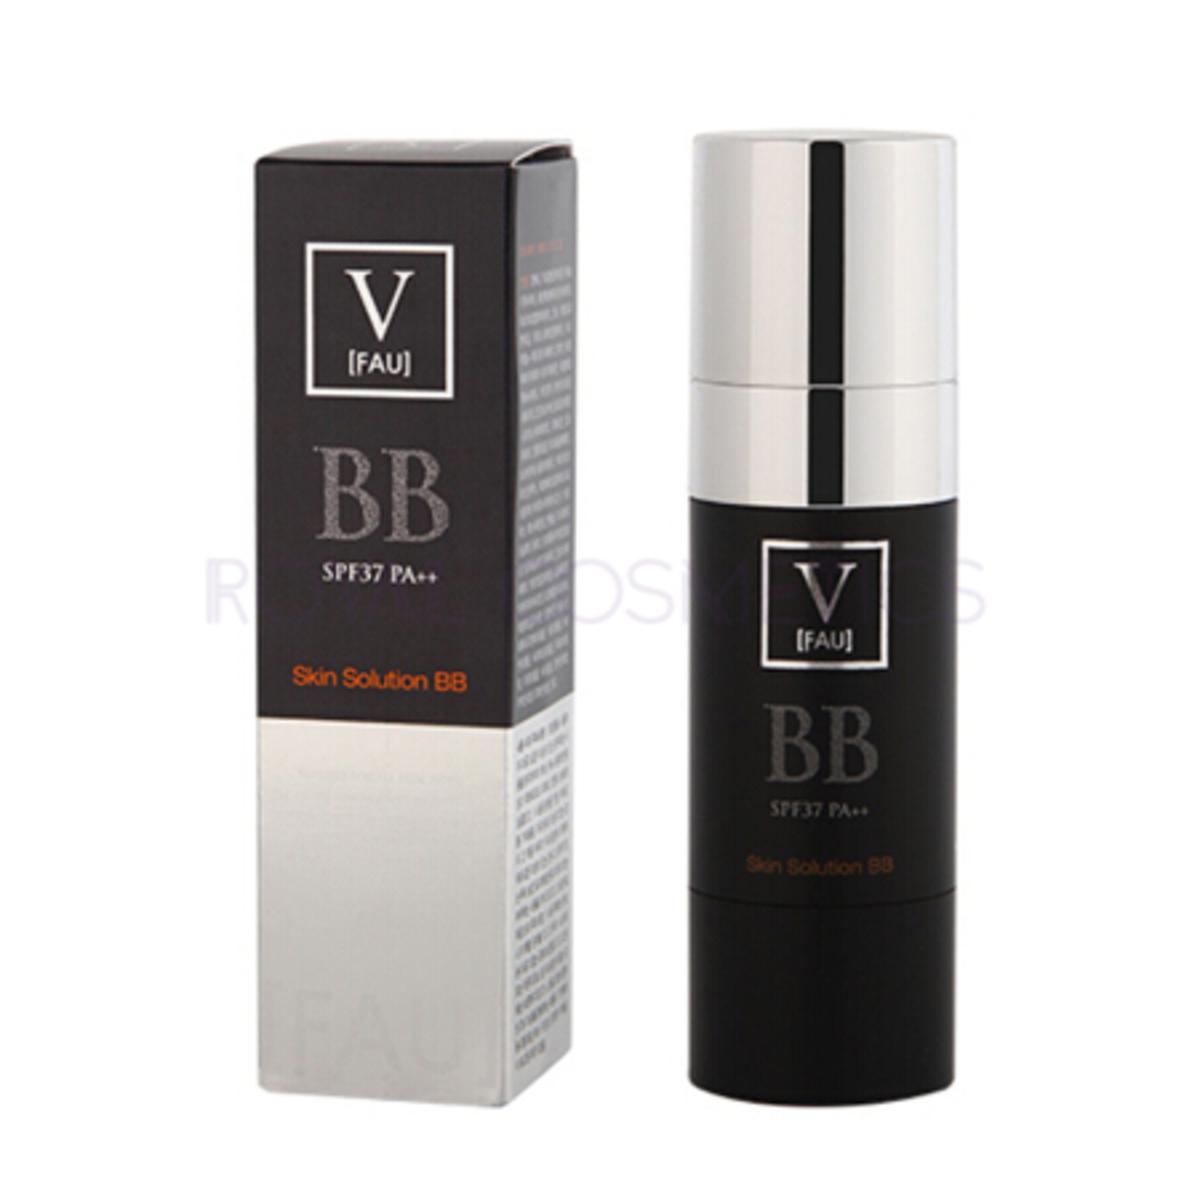 Skin Solution BB 30g (8809512880306)